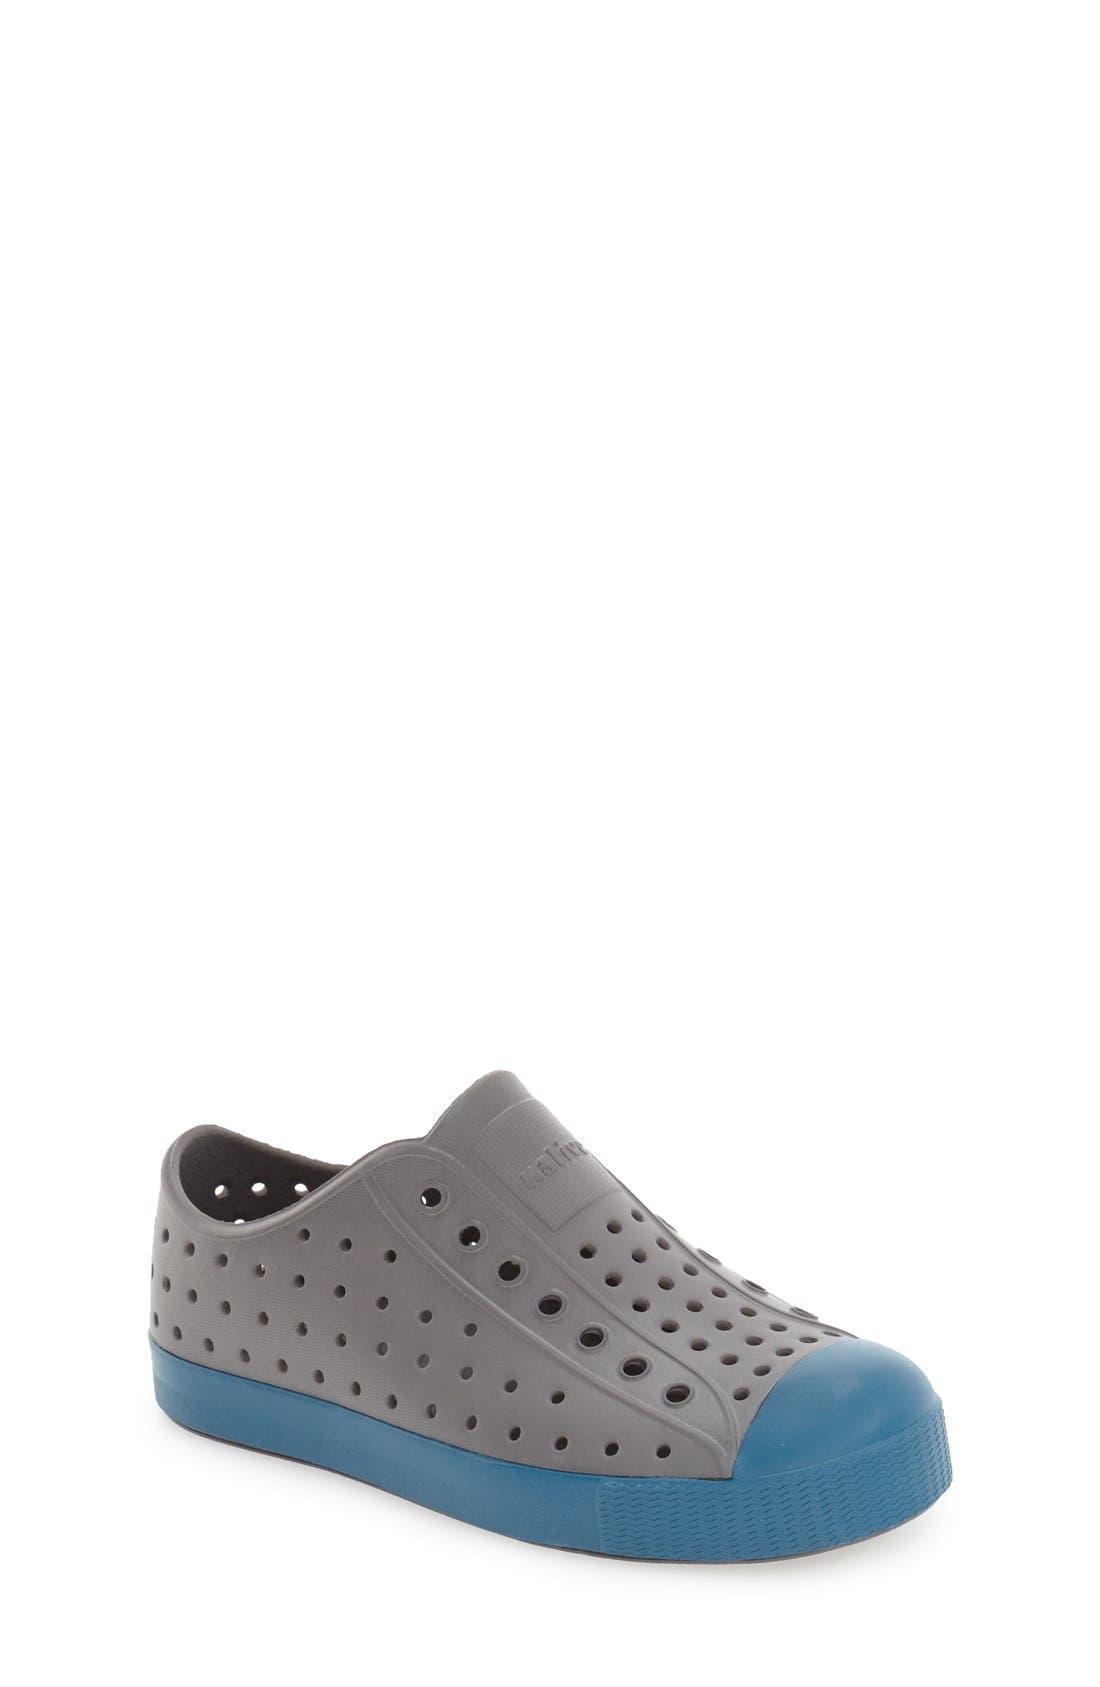 'Jefferson' Water Friendly Slip-On Sneaker,                             Main thumbnail 35, color,